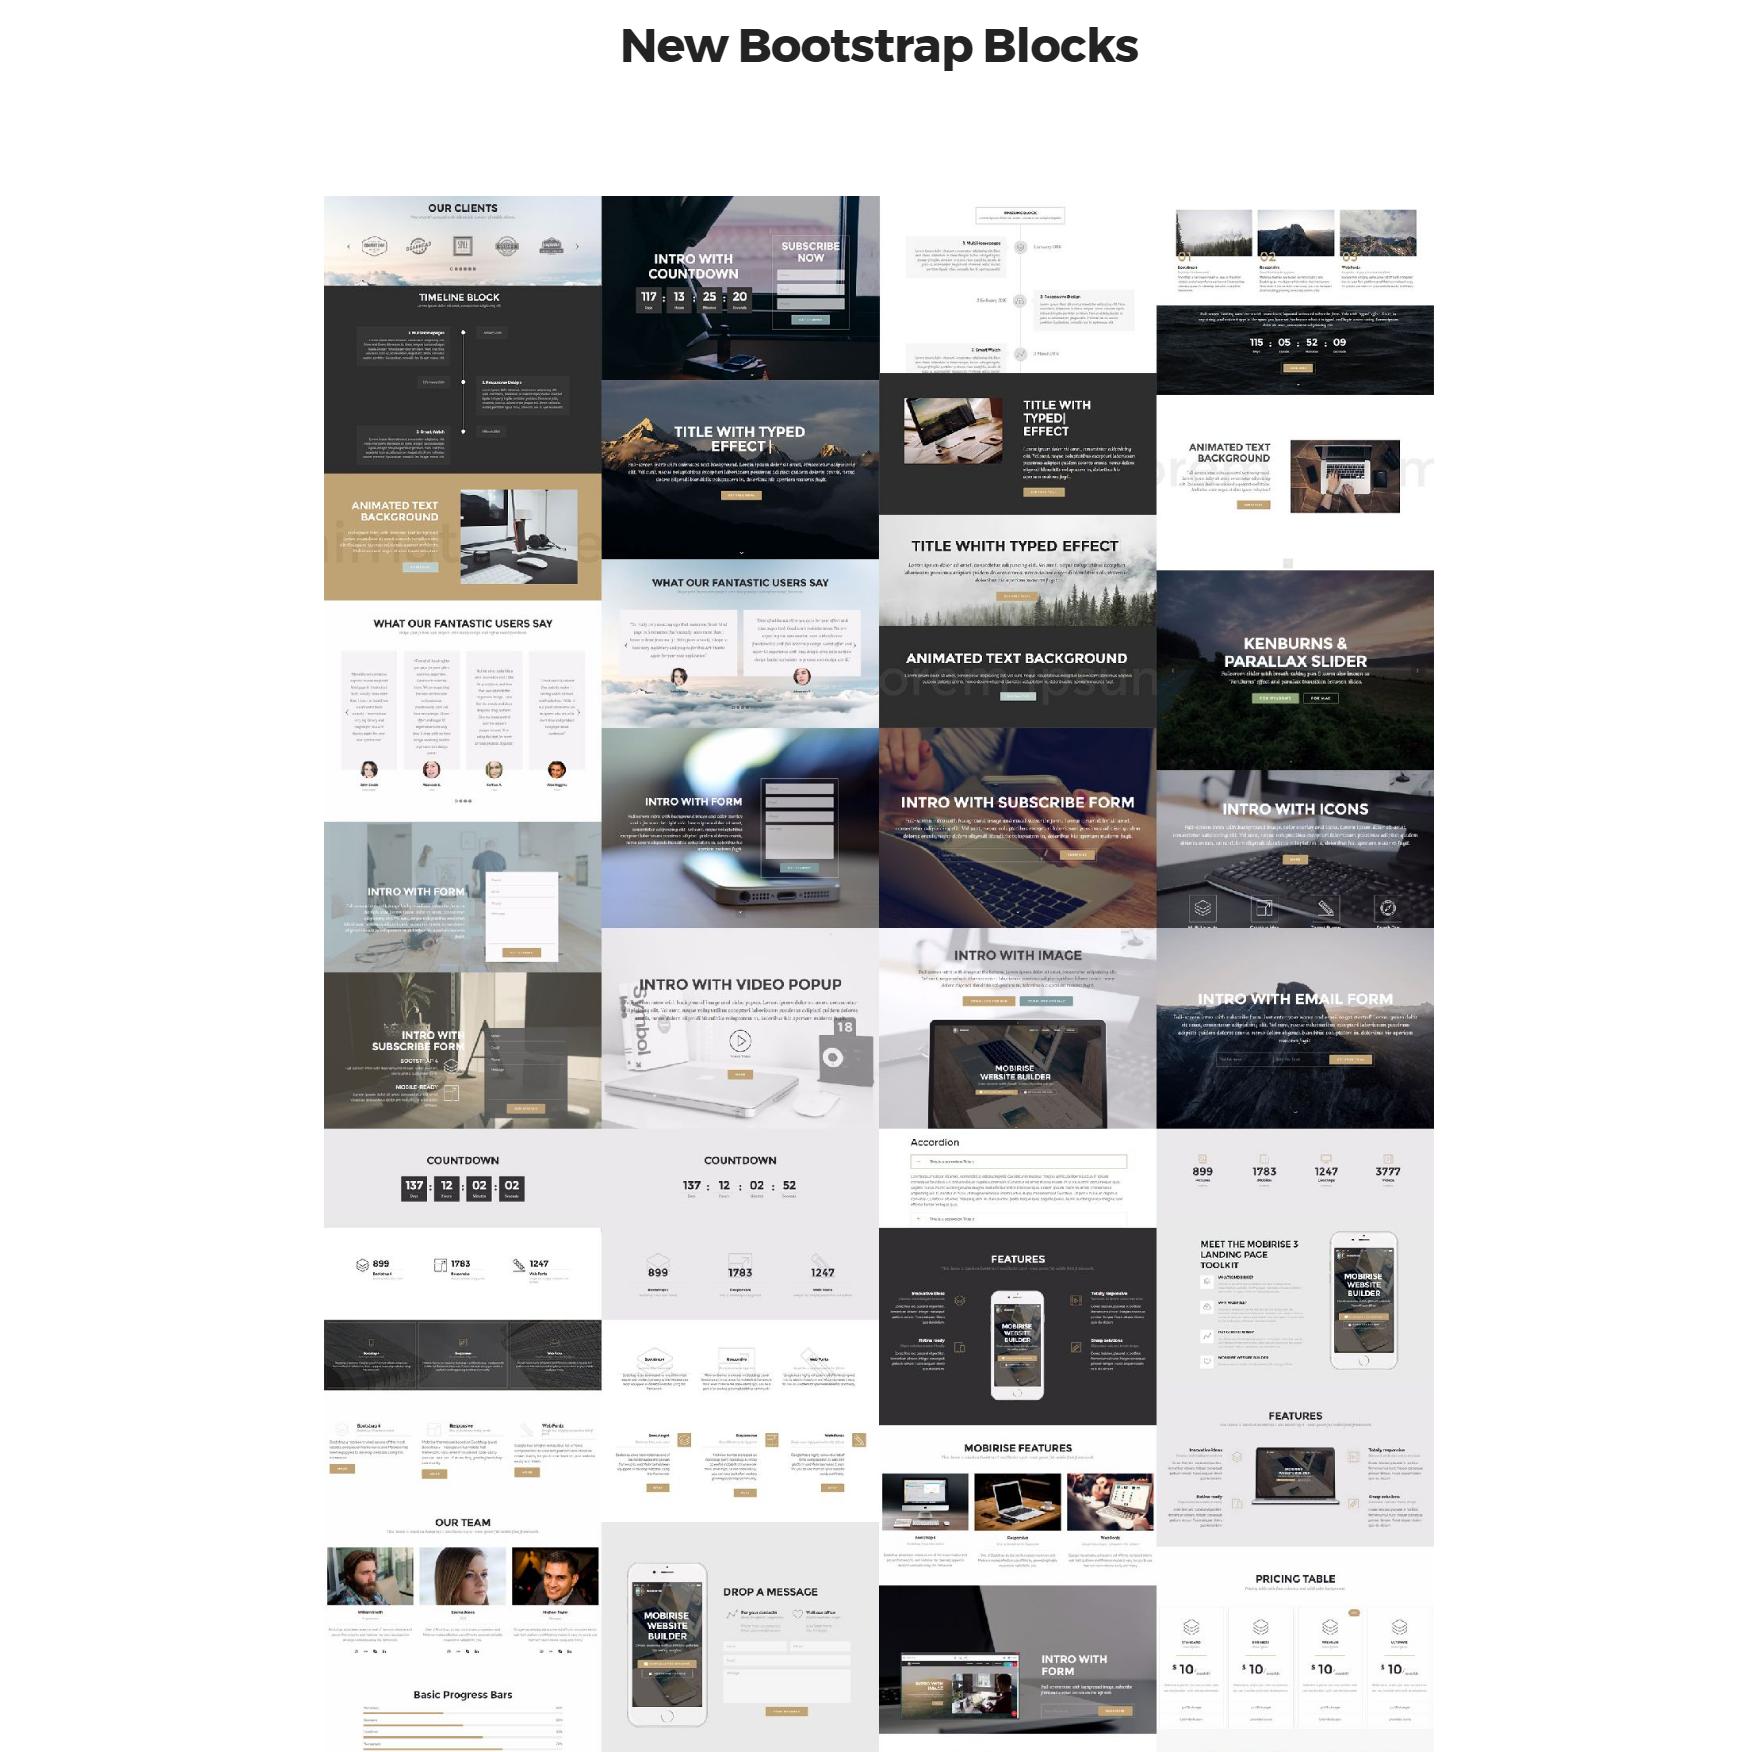 Responsive Bootstrap 4 mobile-friendly blocks Templates